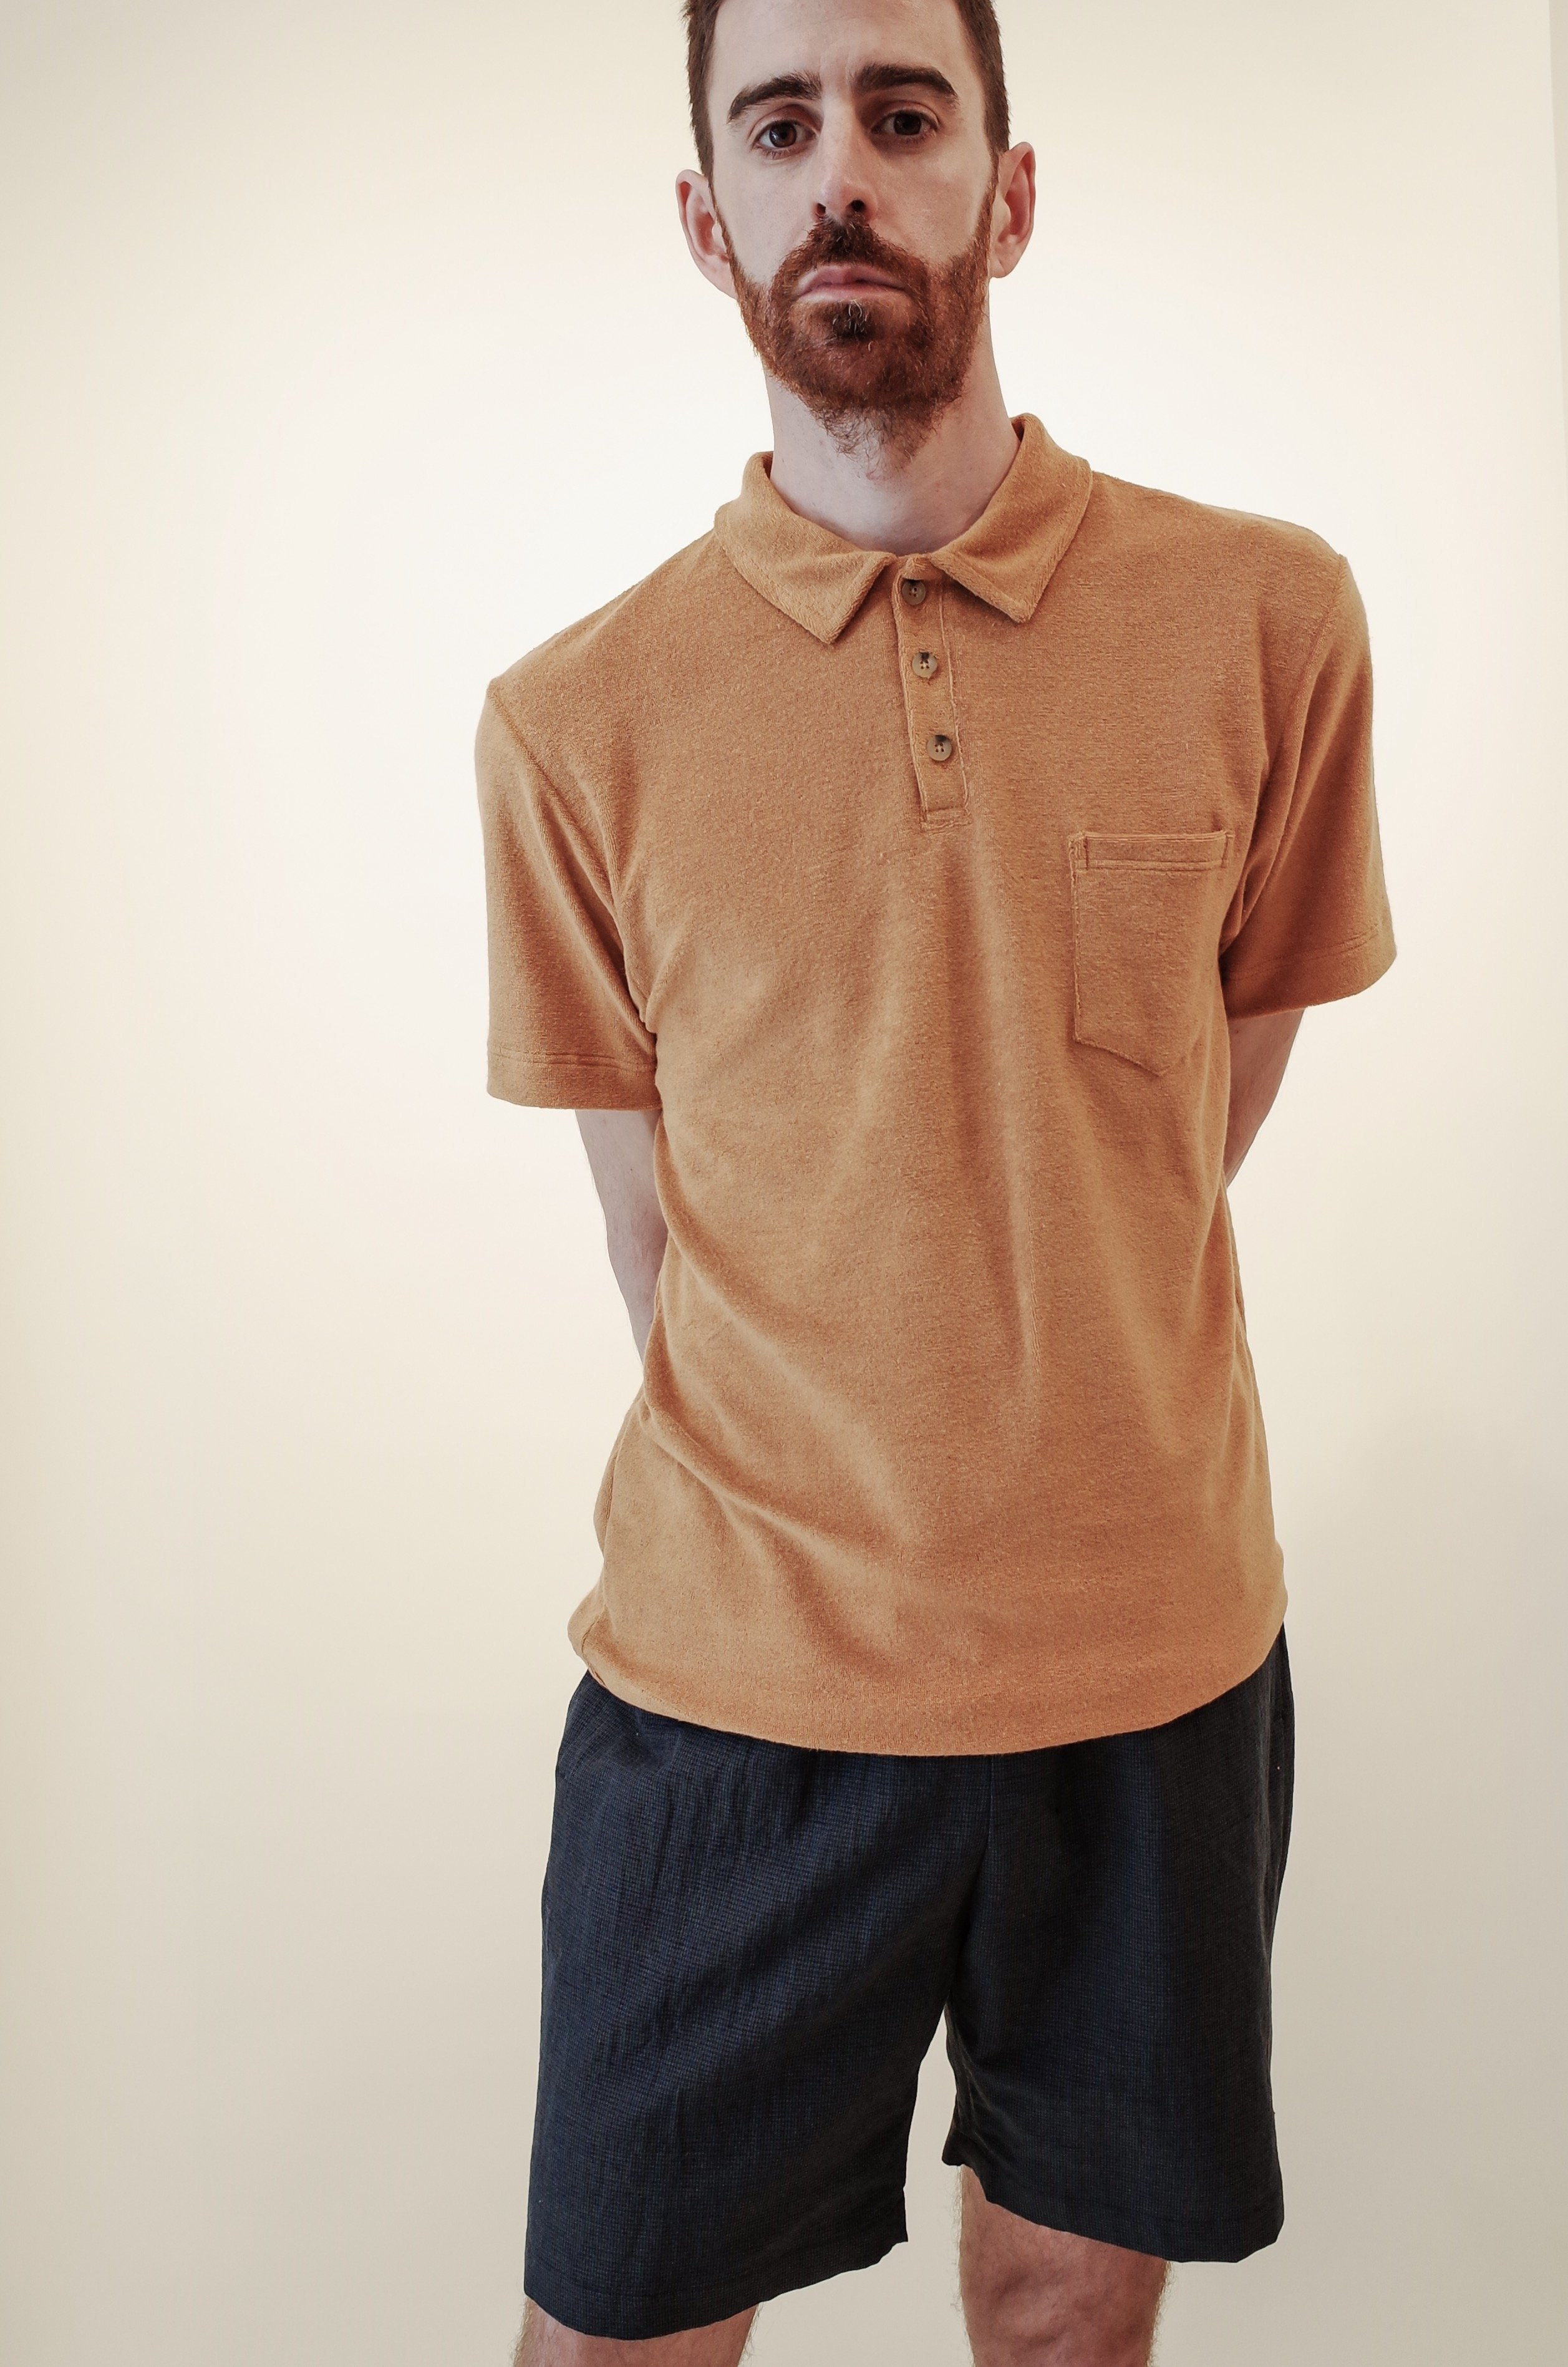 c3c45172383 Howlin by Morrison Mr. Fantasy Polo Shirt - Bronze